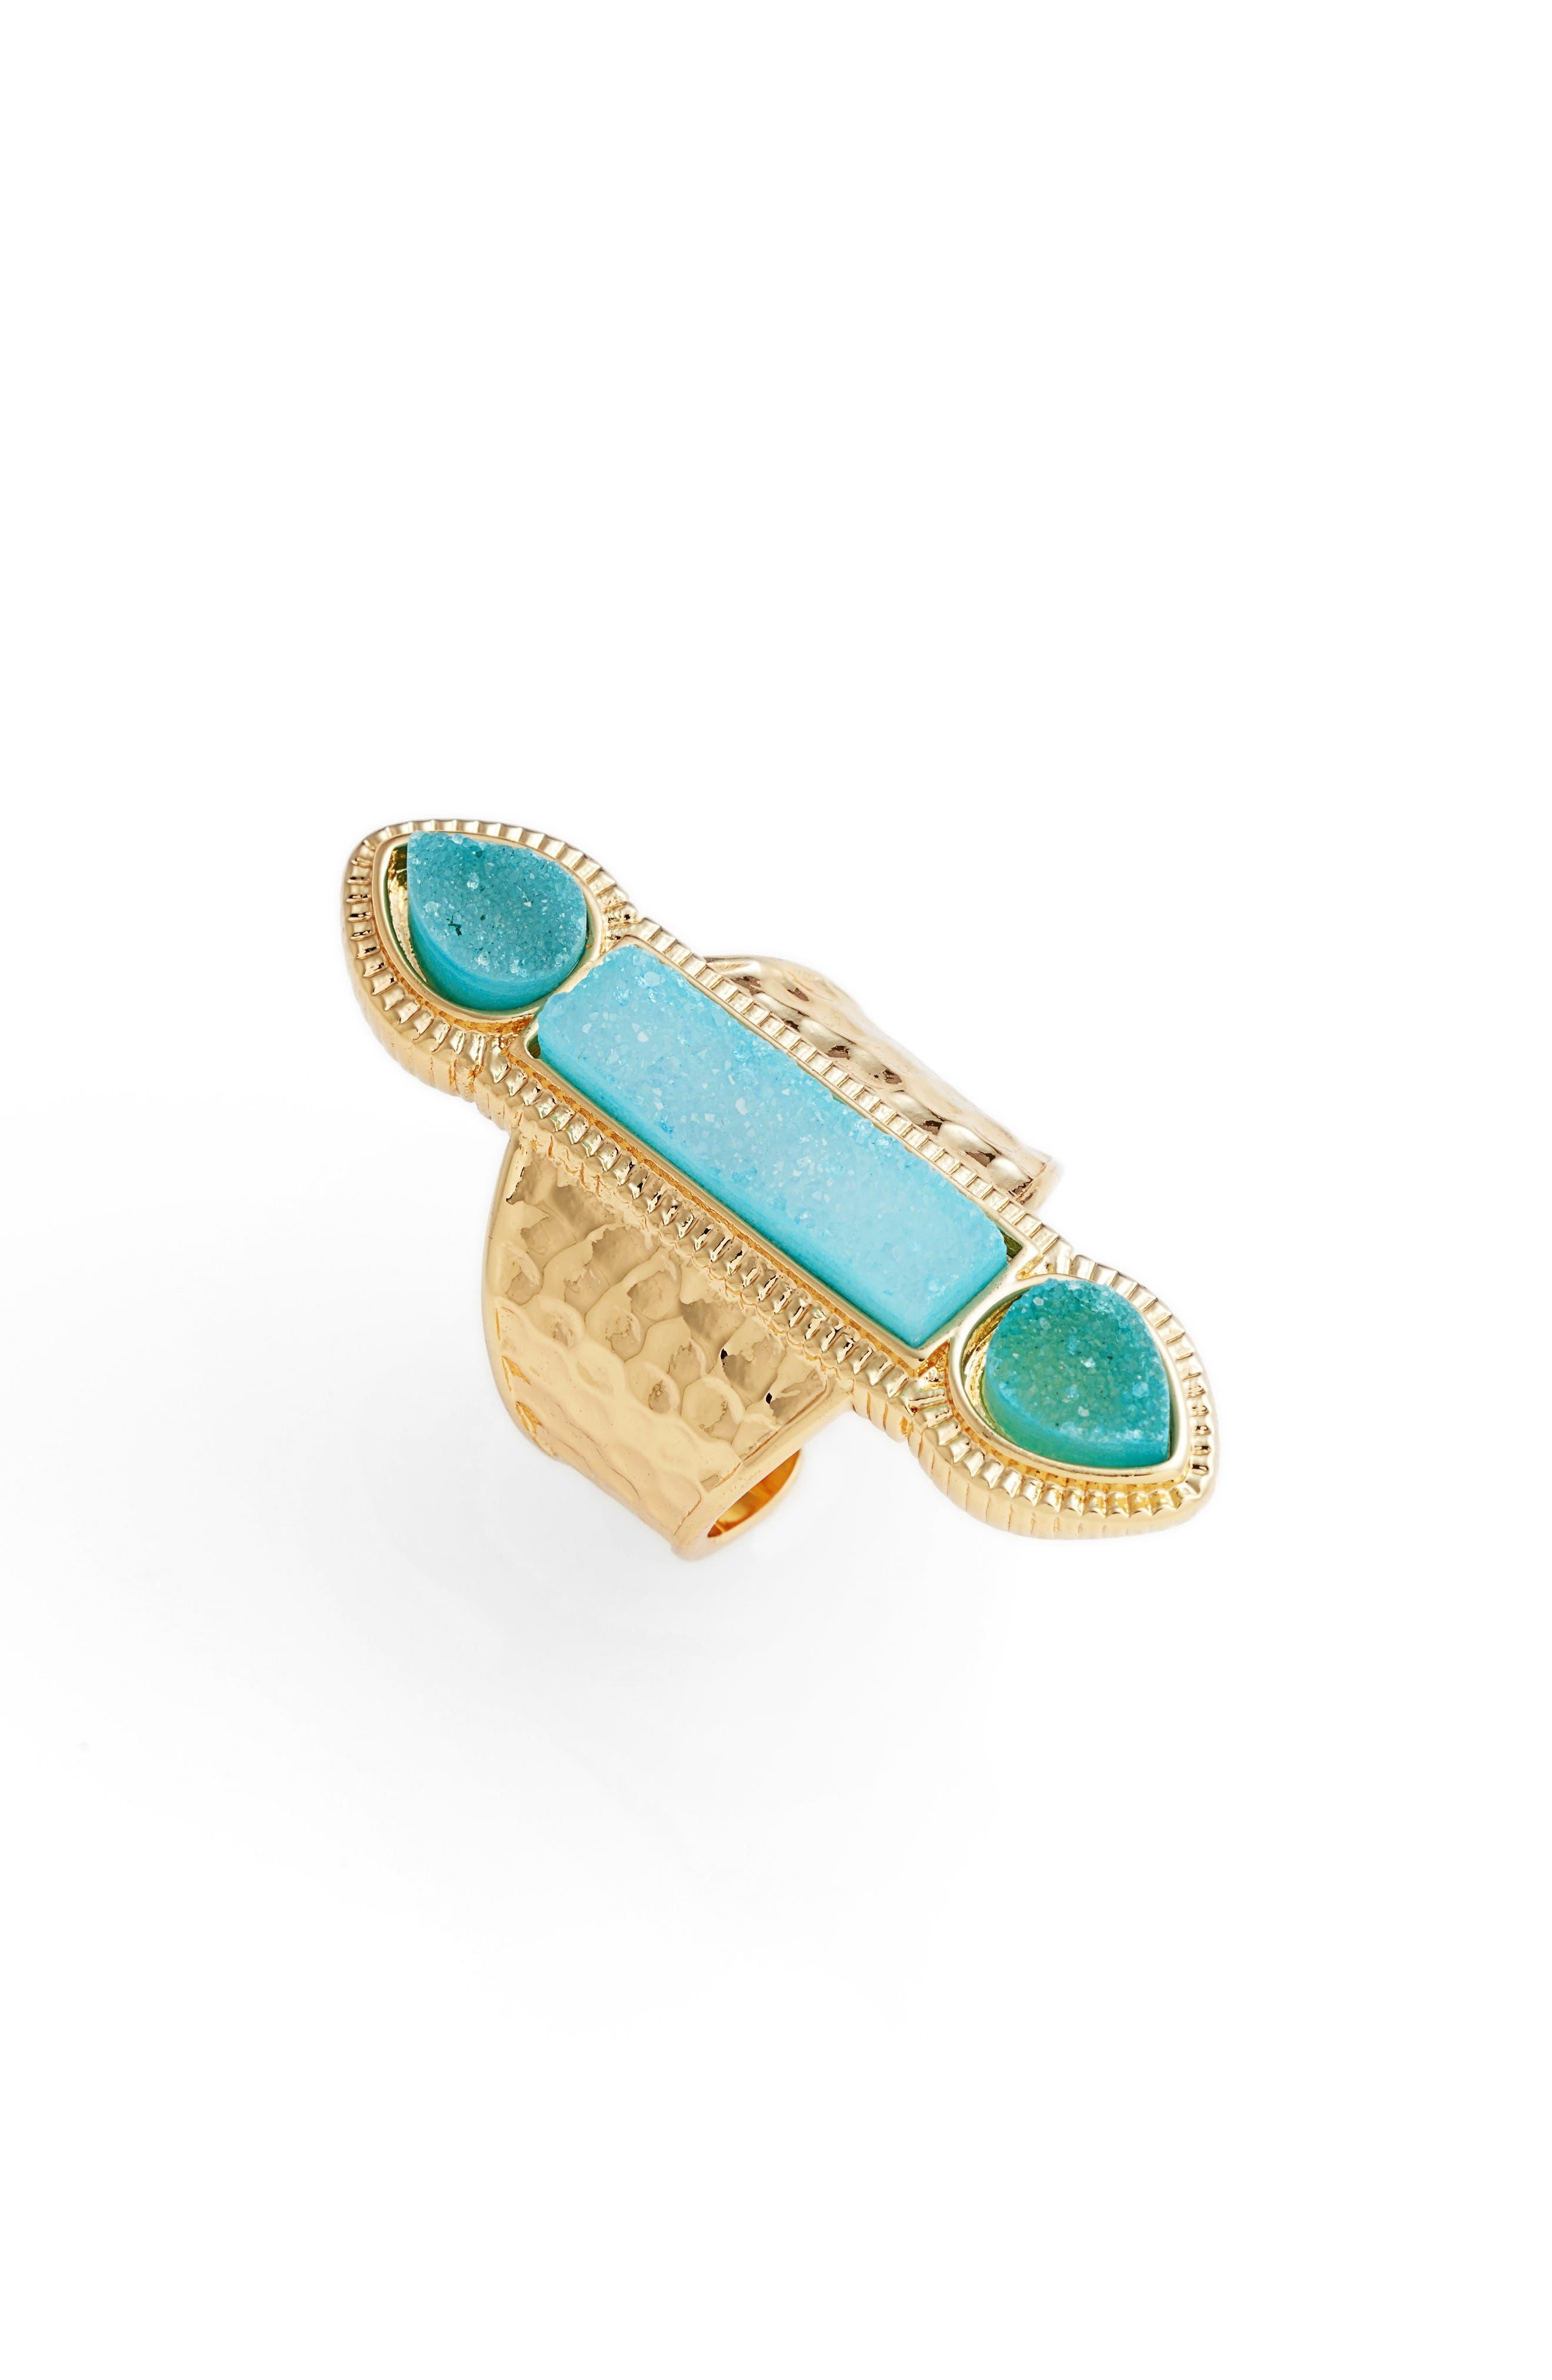 Pyramid Drusy Quartz Adjustable Ring,                         Main,                         color, Light Blue Druzy